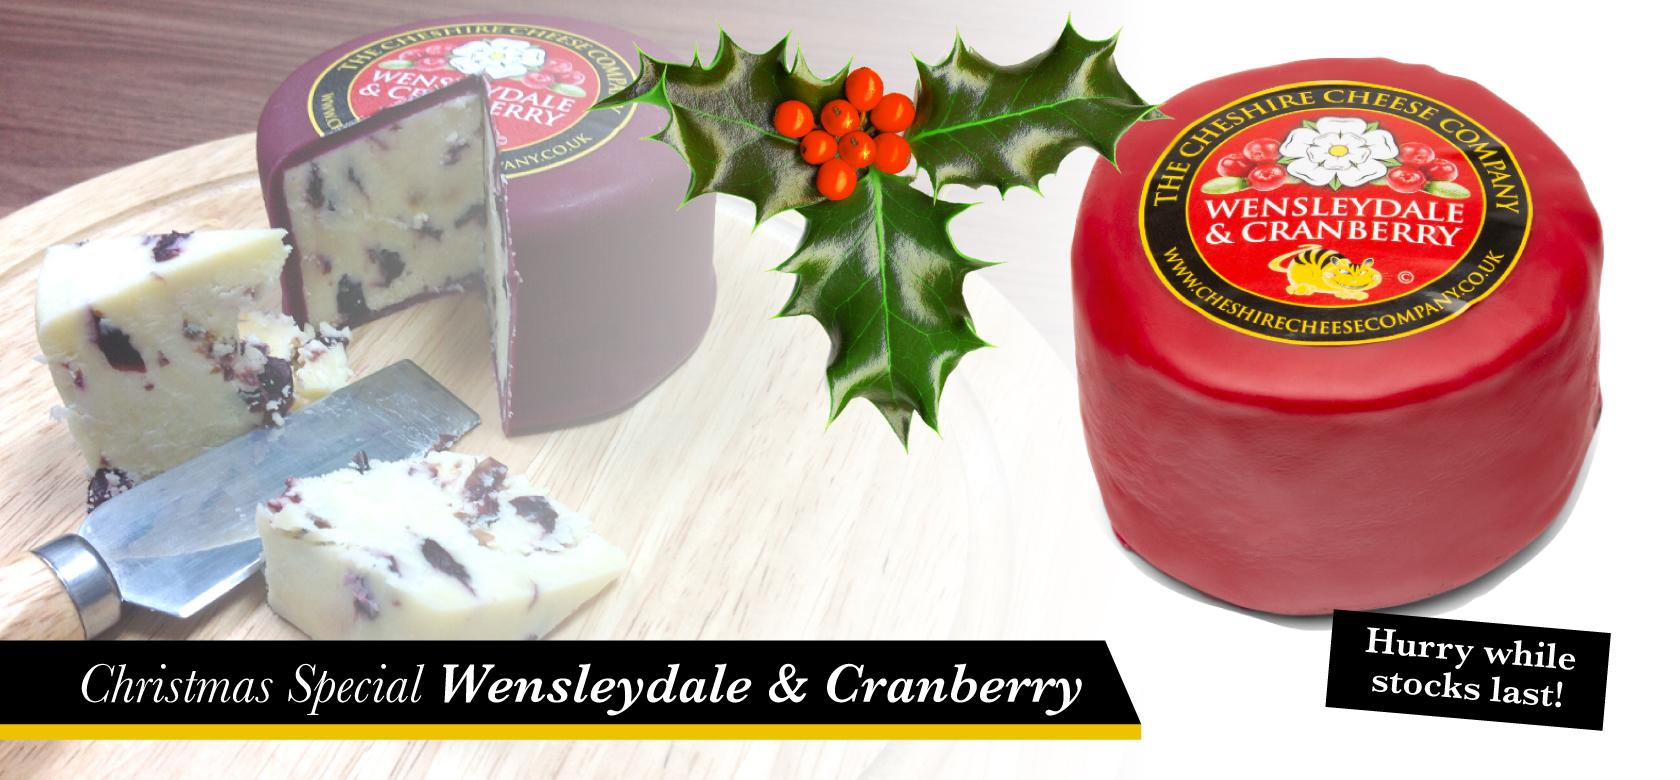 Wensleydale & Cranberry Cheese